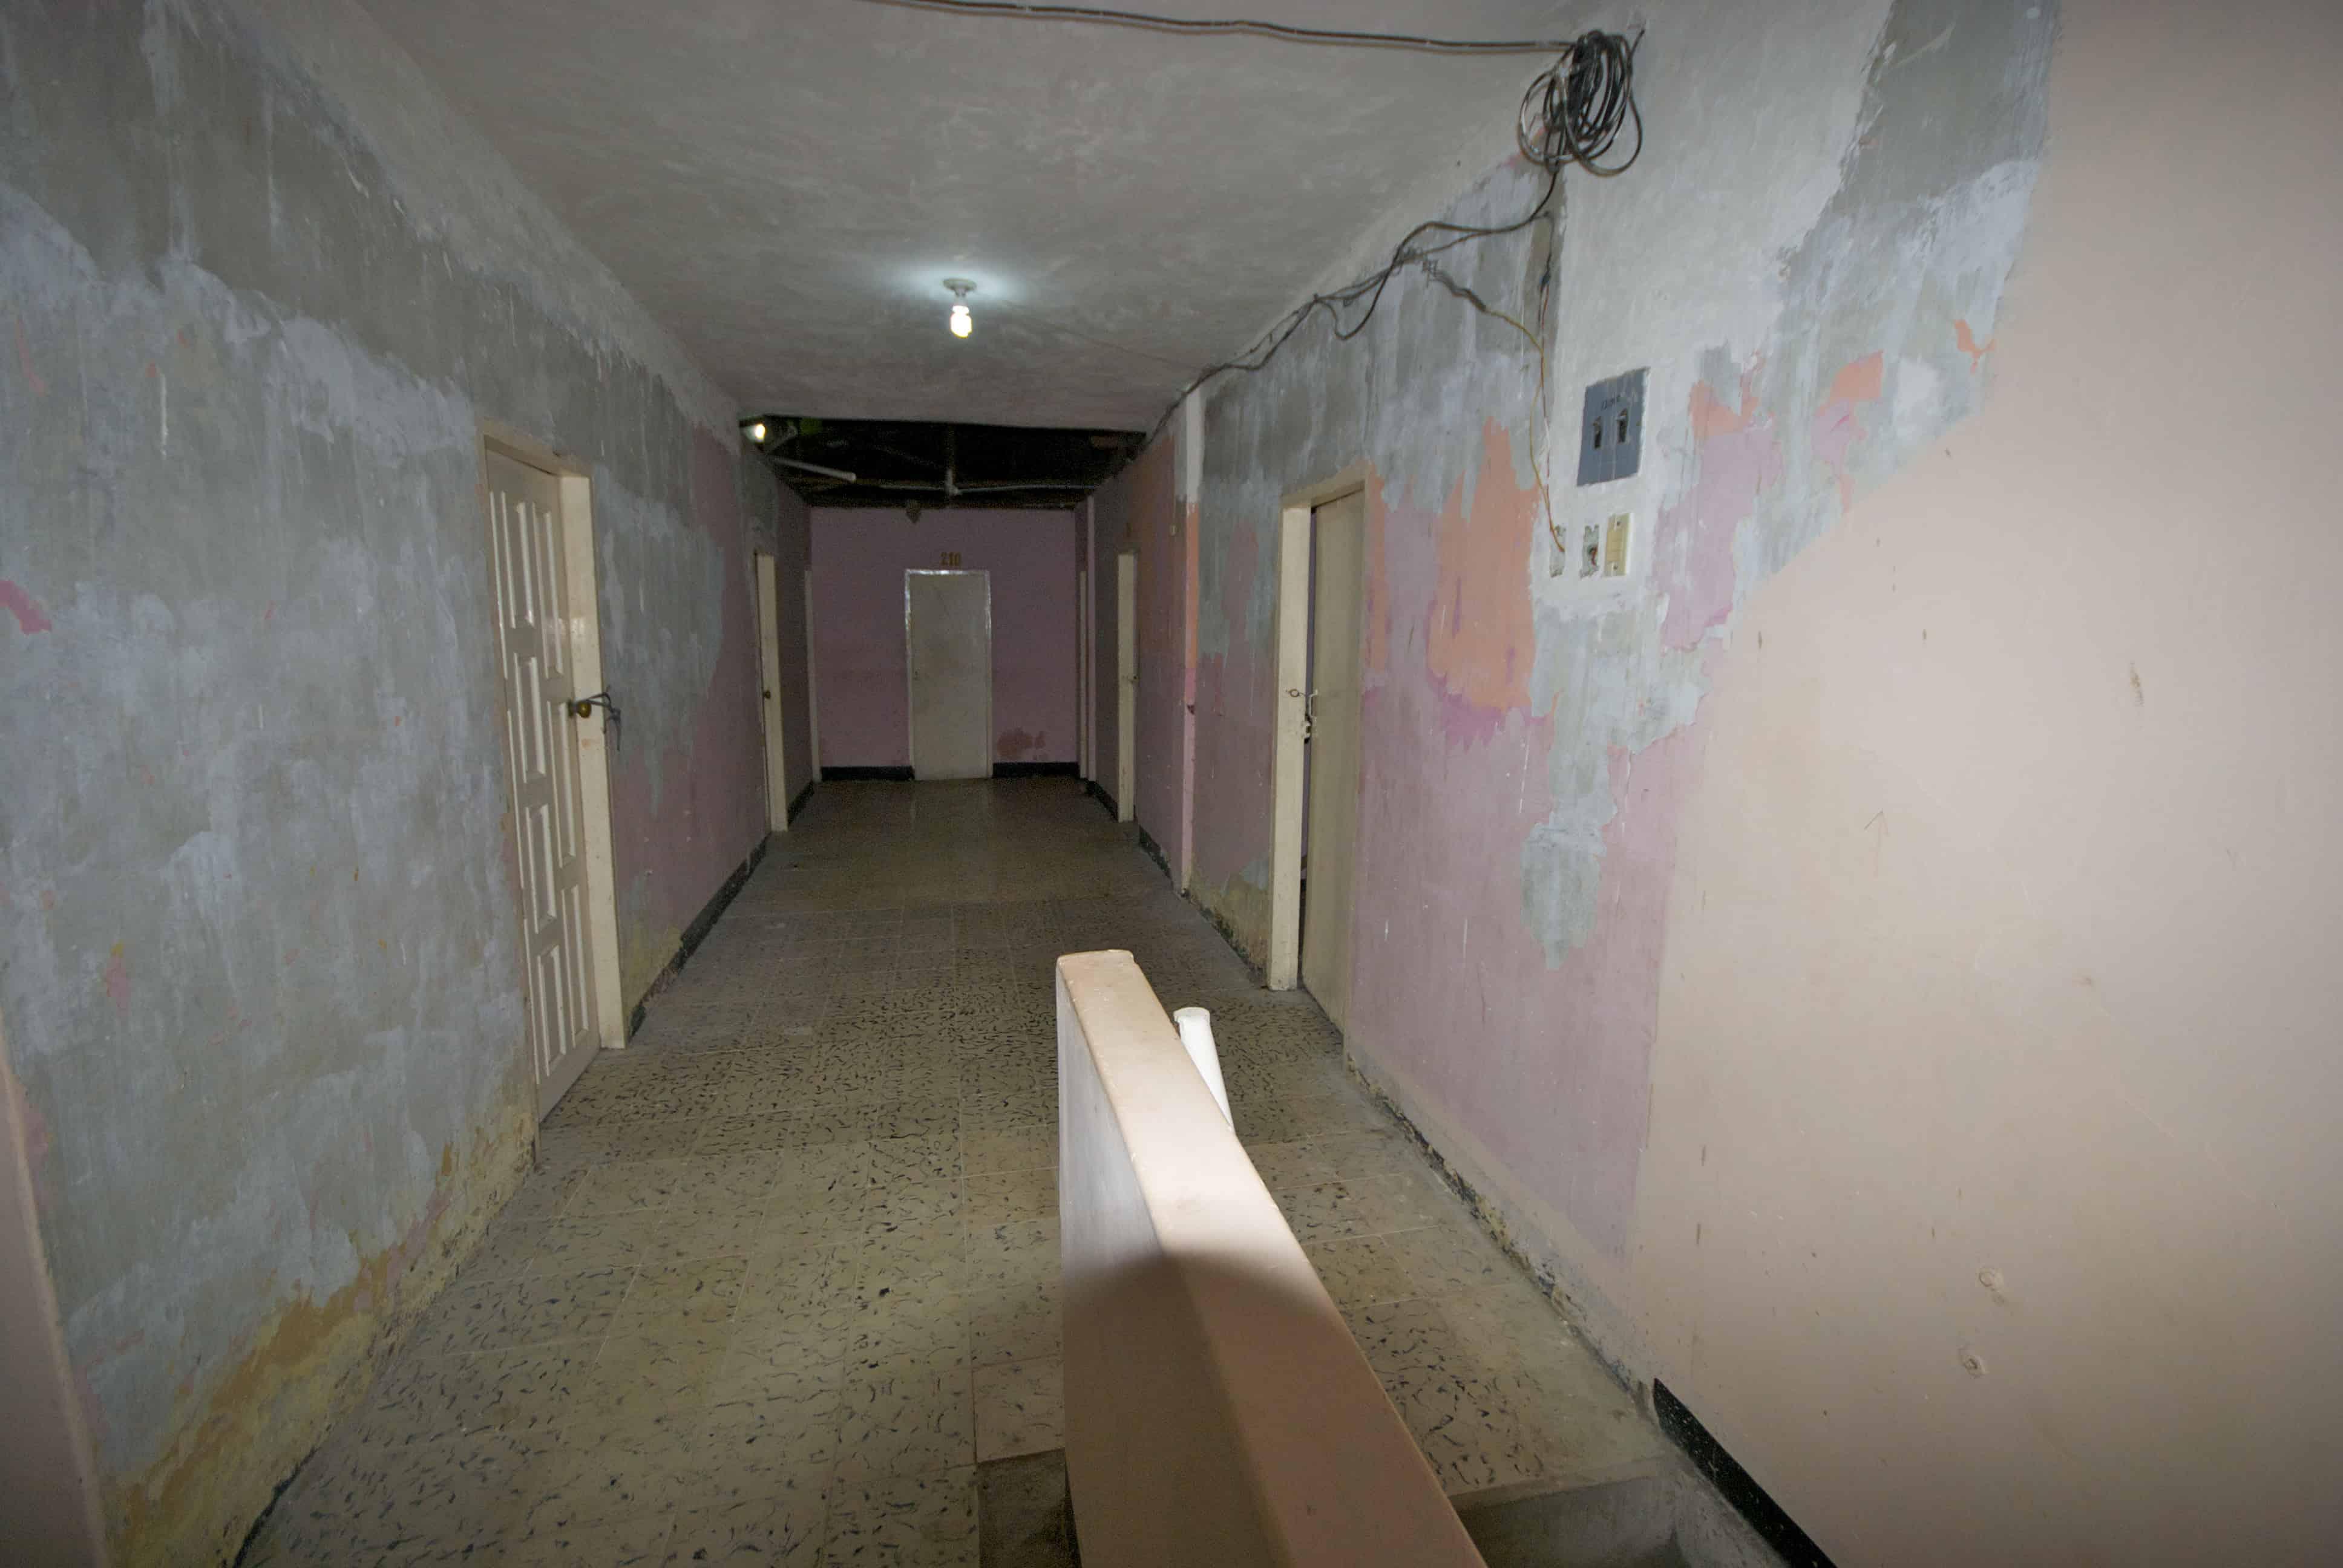 Bad hotel hallway Colombia